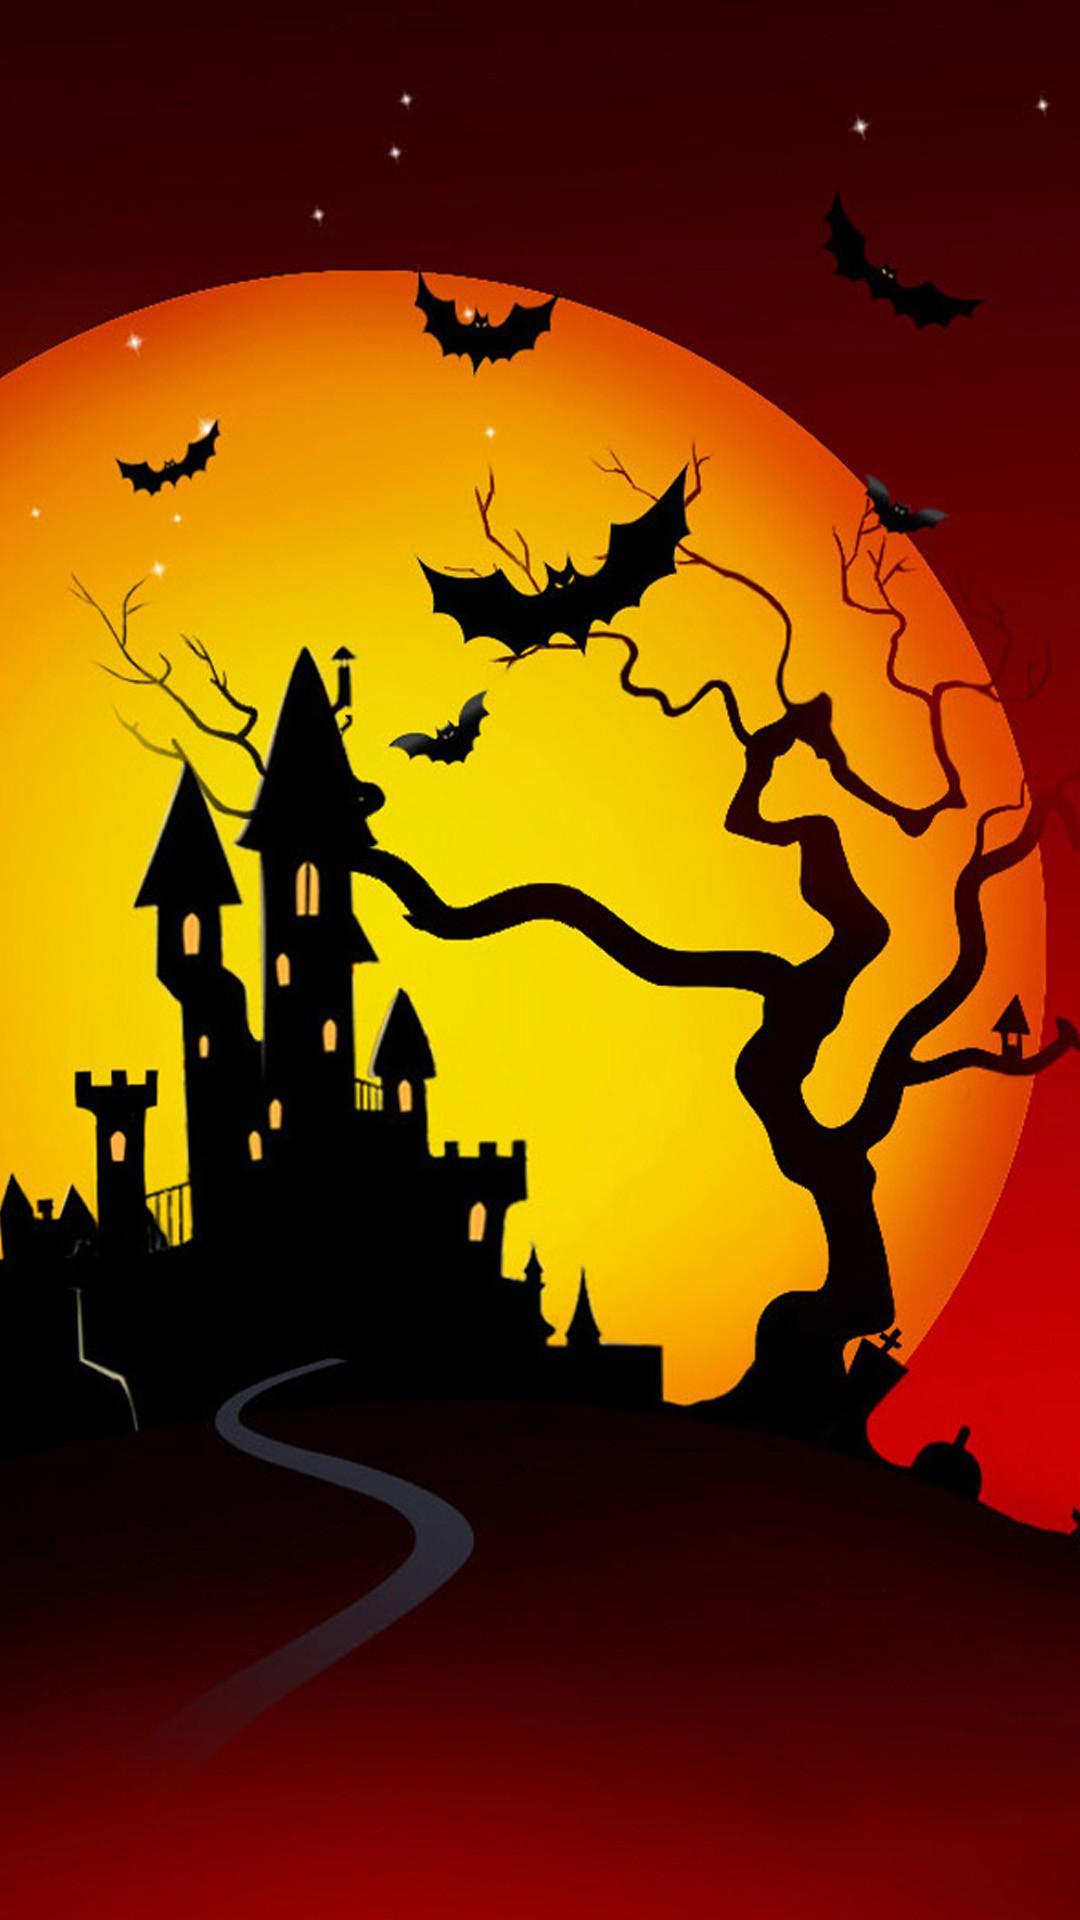 Halloween night iphone 6 plus wallpaper | iPhone 6 Plus Wallpapers HD